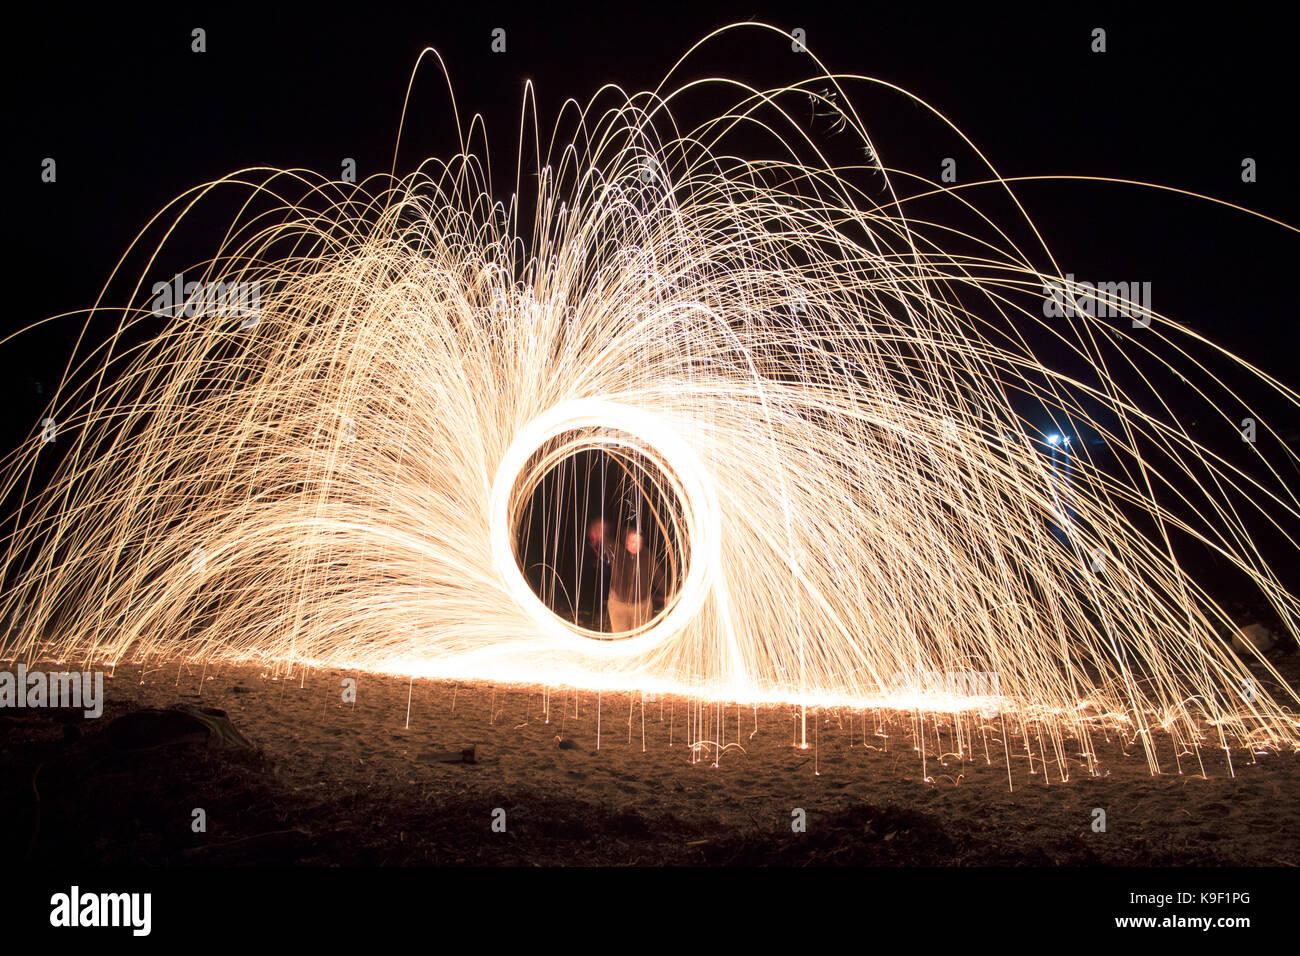 Steel wool spinning Stock Photo